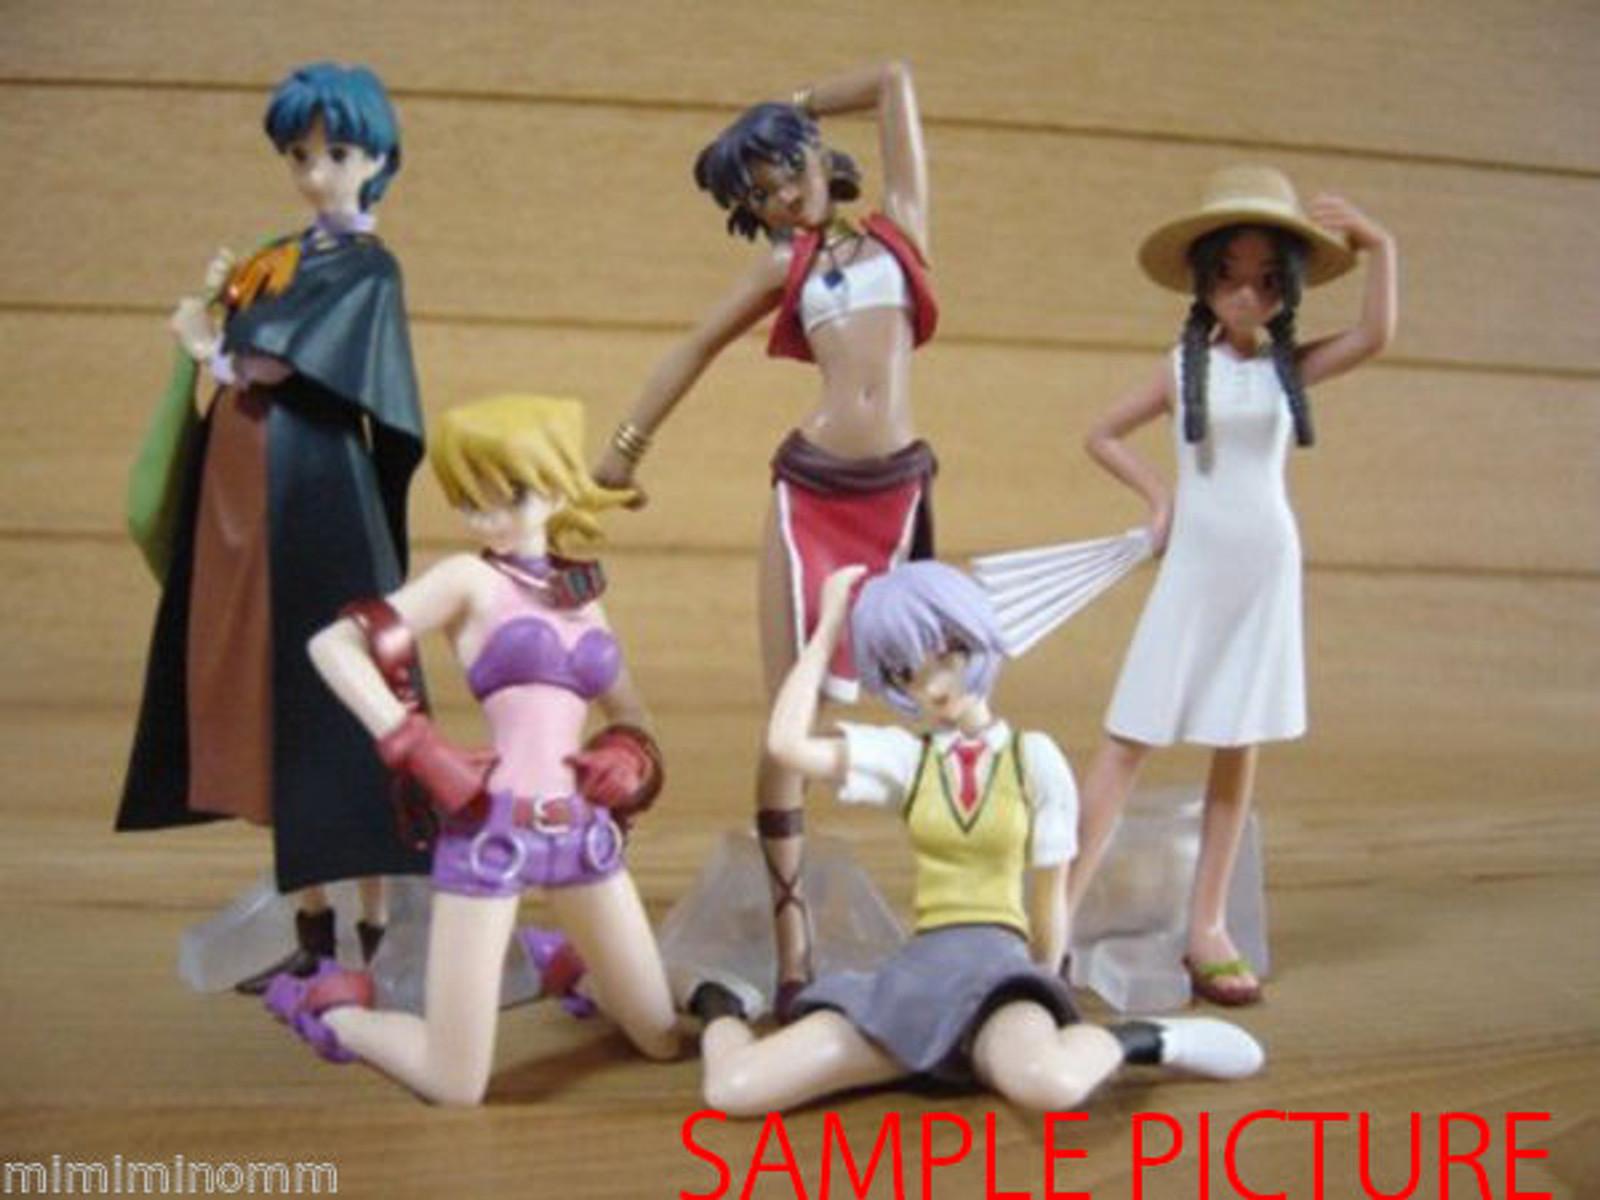 Set of 5 GAINAX Heroines Mini Figure Vol.1 [Leiqunni/Nadia/Rei/Arumi/Sayoko] JAPAN